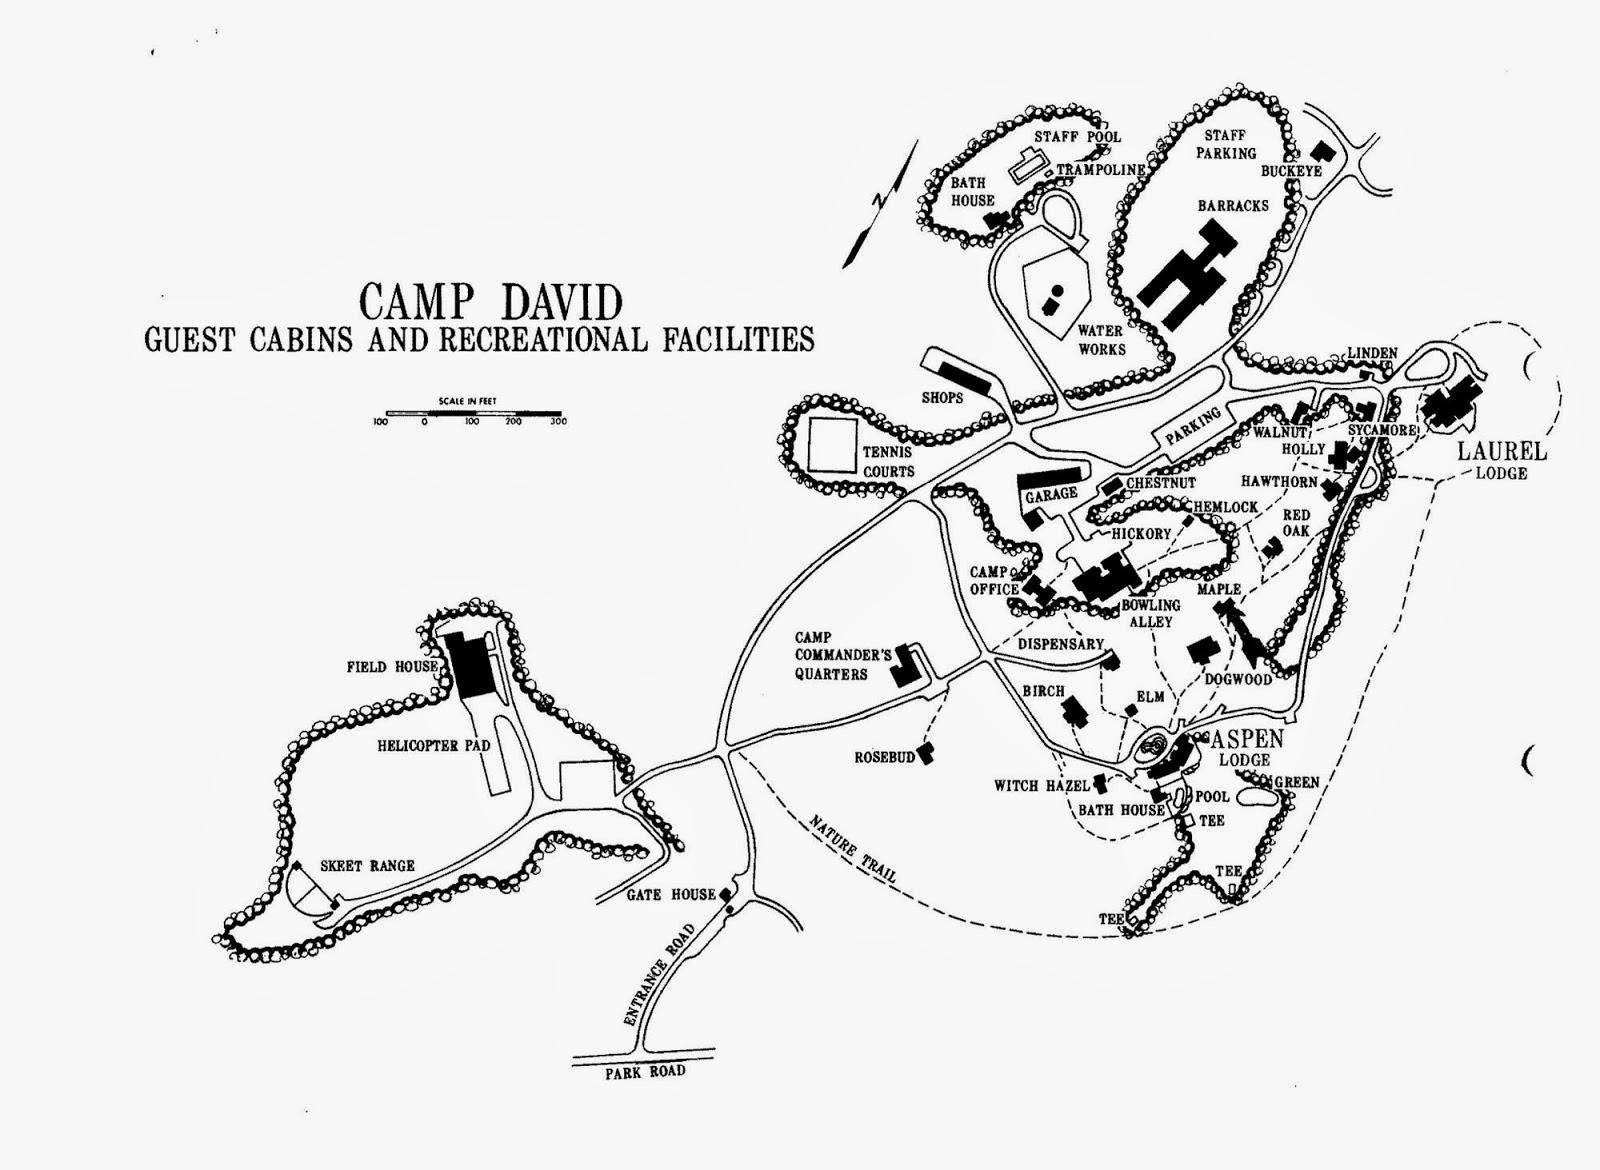 About Camp David Weekend Meeting At Camp David